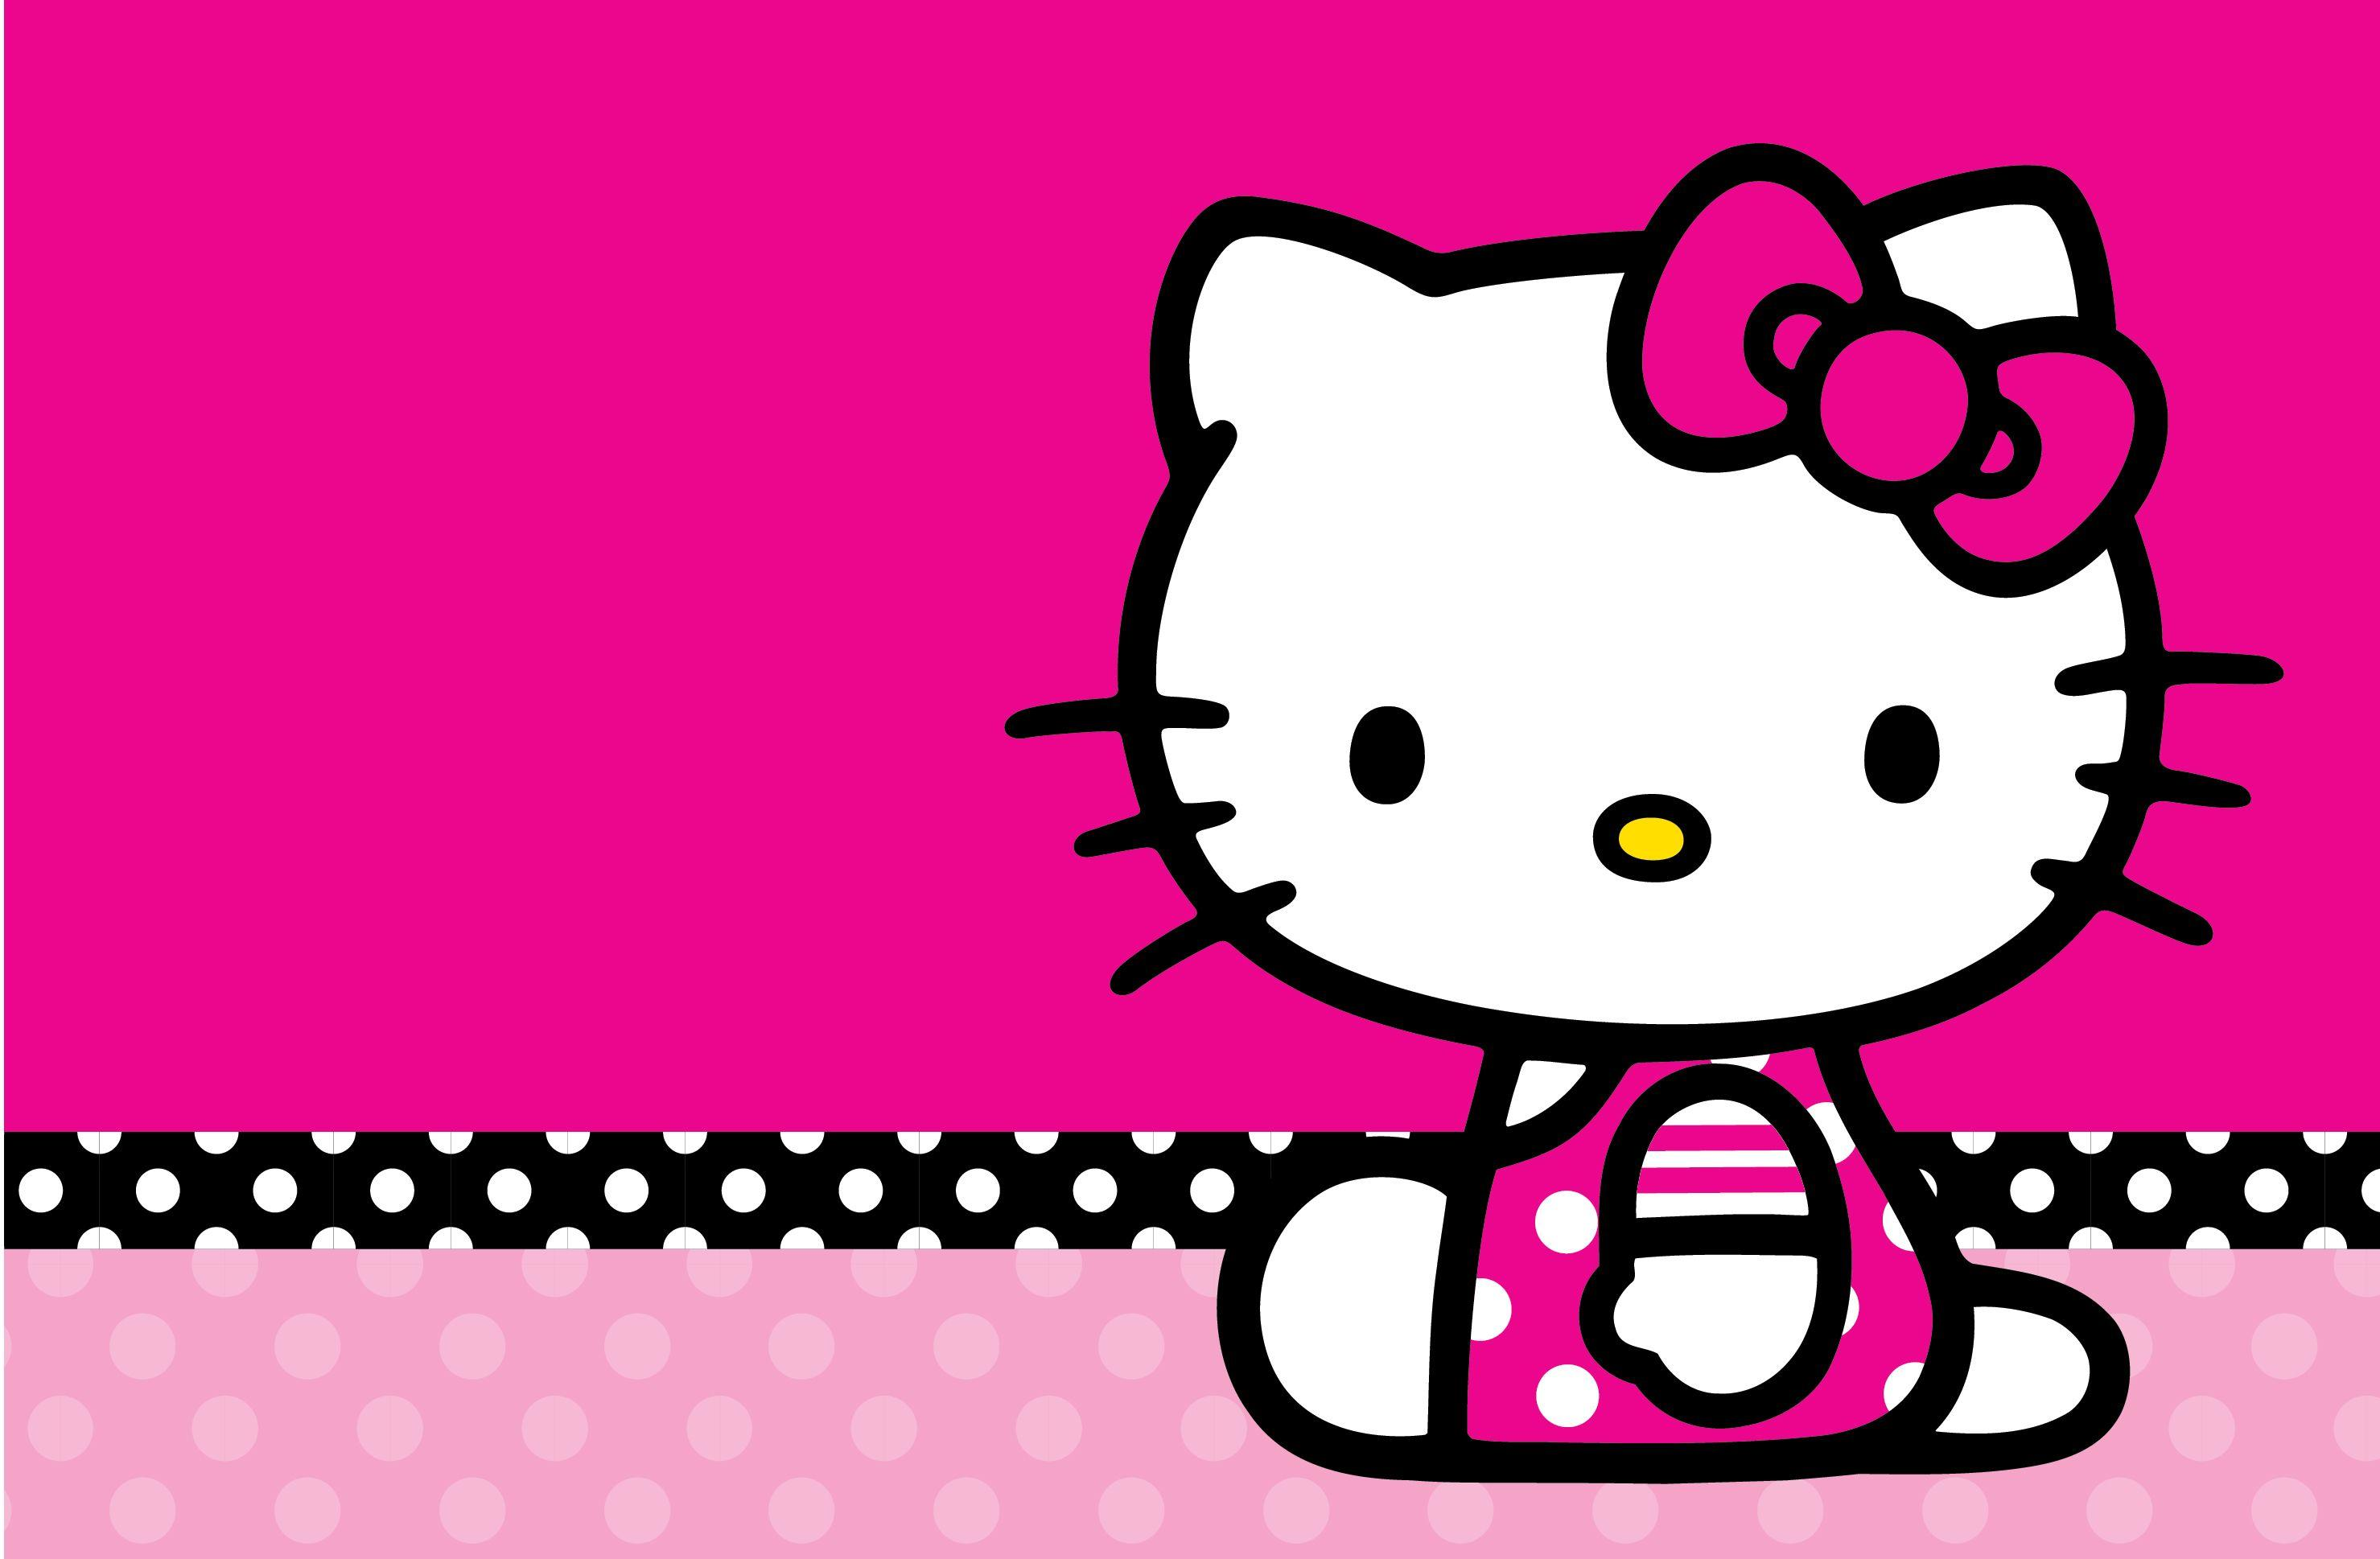 Best Wallpaper Hello Kitty Leopard Print - wp2499589  Picture_542182.jpg